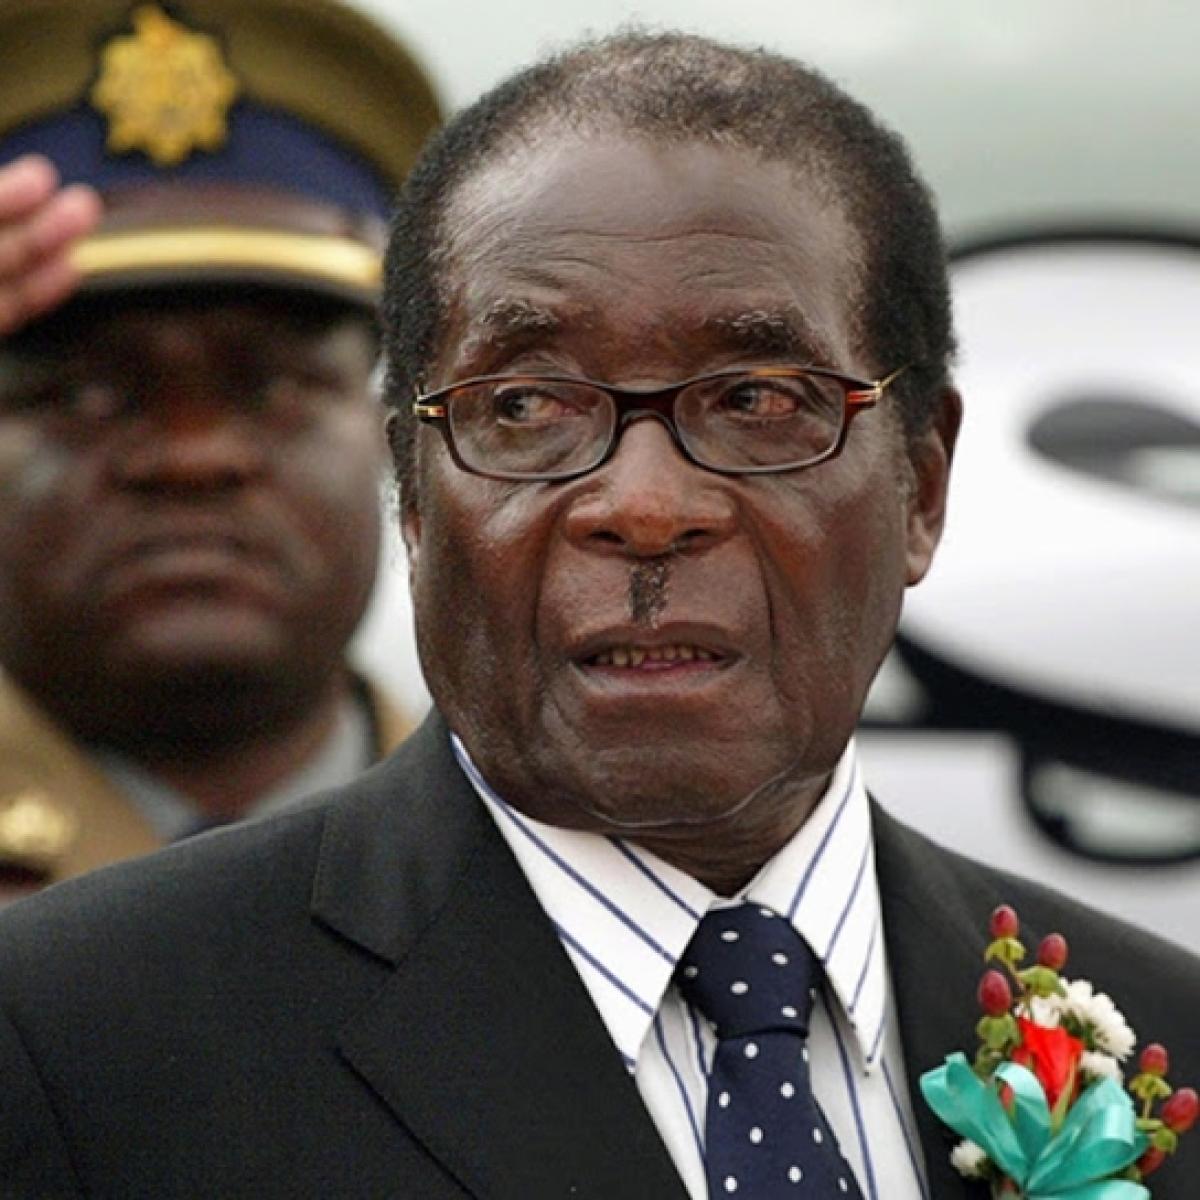 Zimbabwe's former President Robert Mugabe passes away at 95